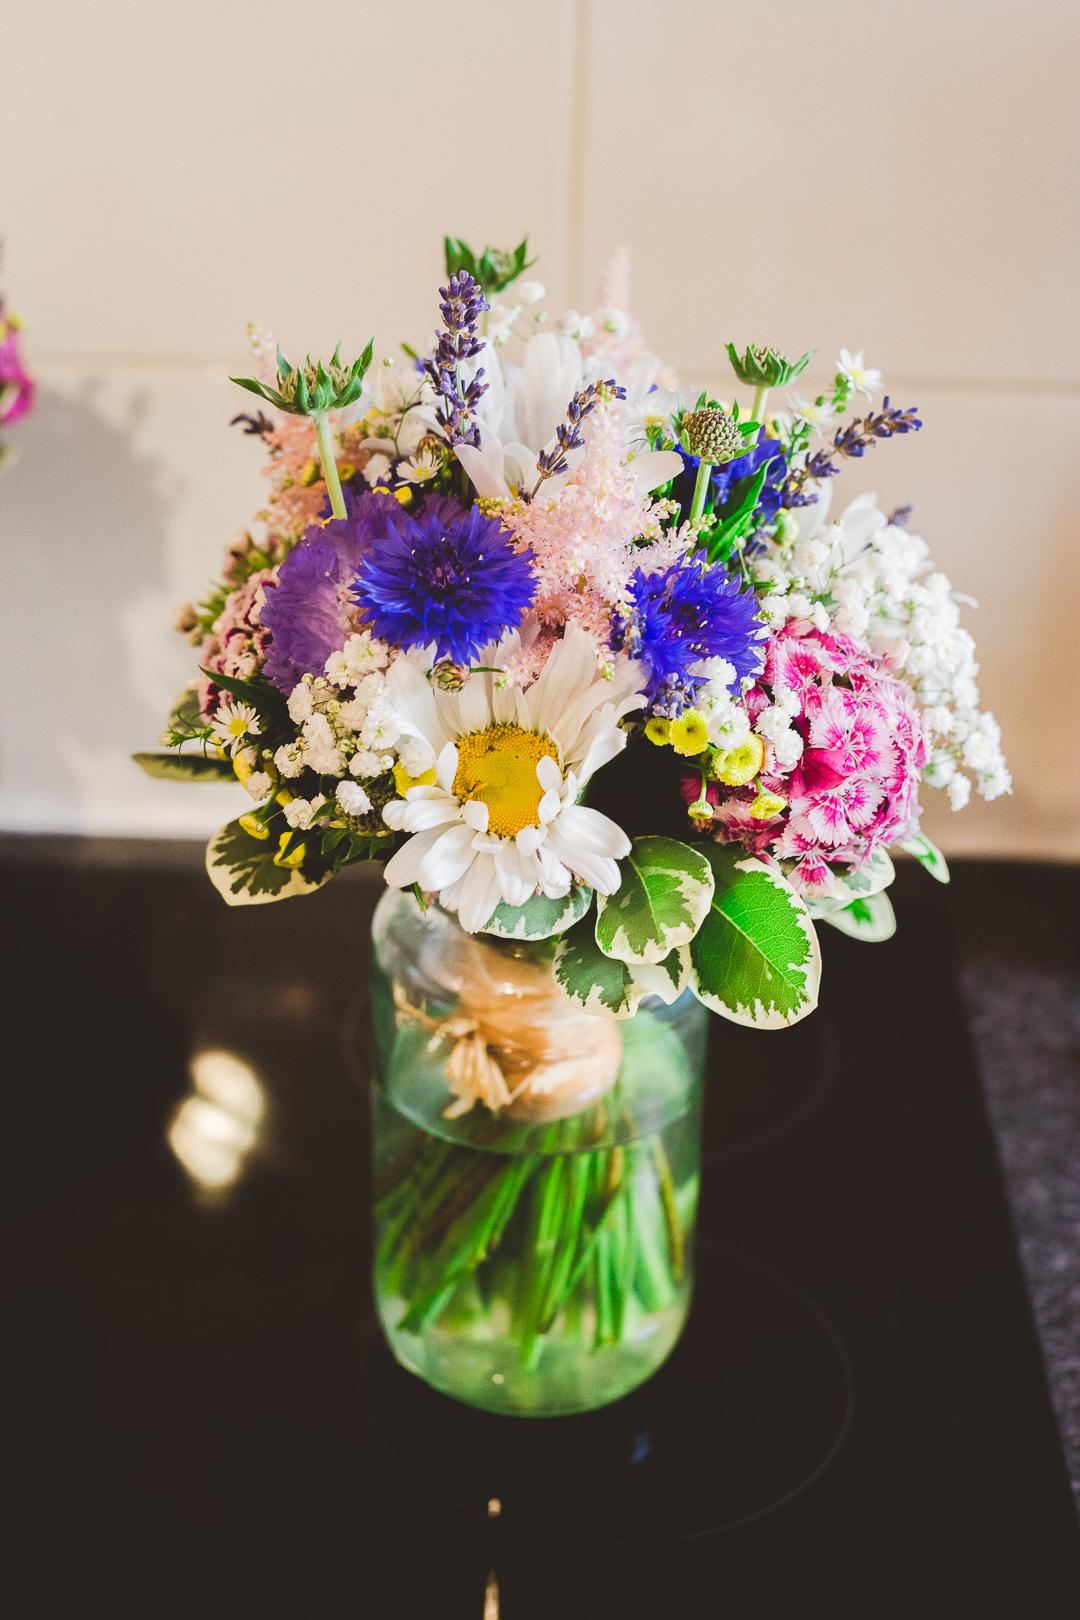 wedding-bouquet-jen-and-matt's-festival-style-wedding